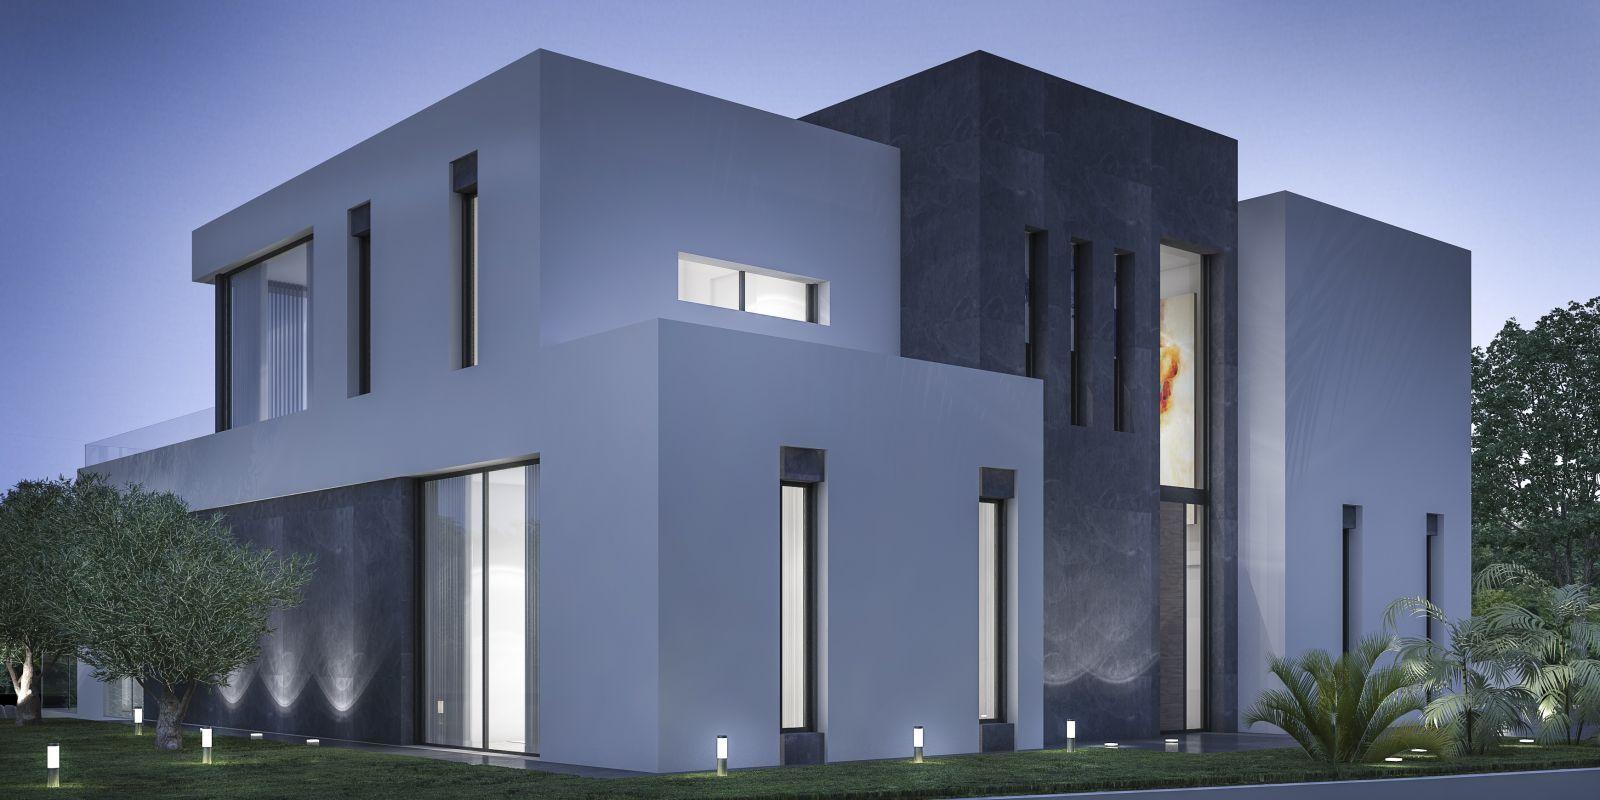 Architettura Case Moderne Idee be spoiled properties, luxury villas javea, new build